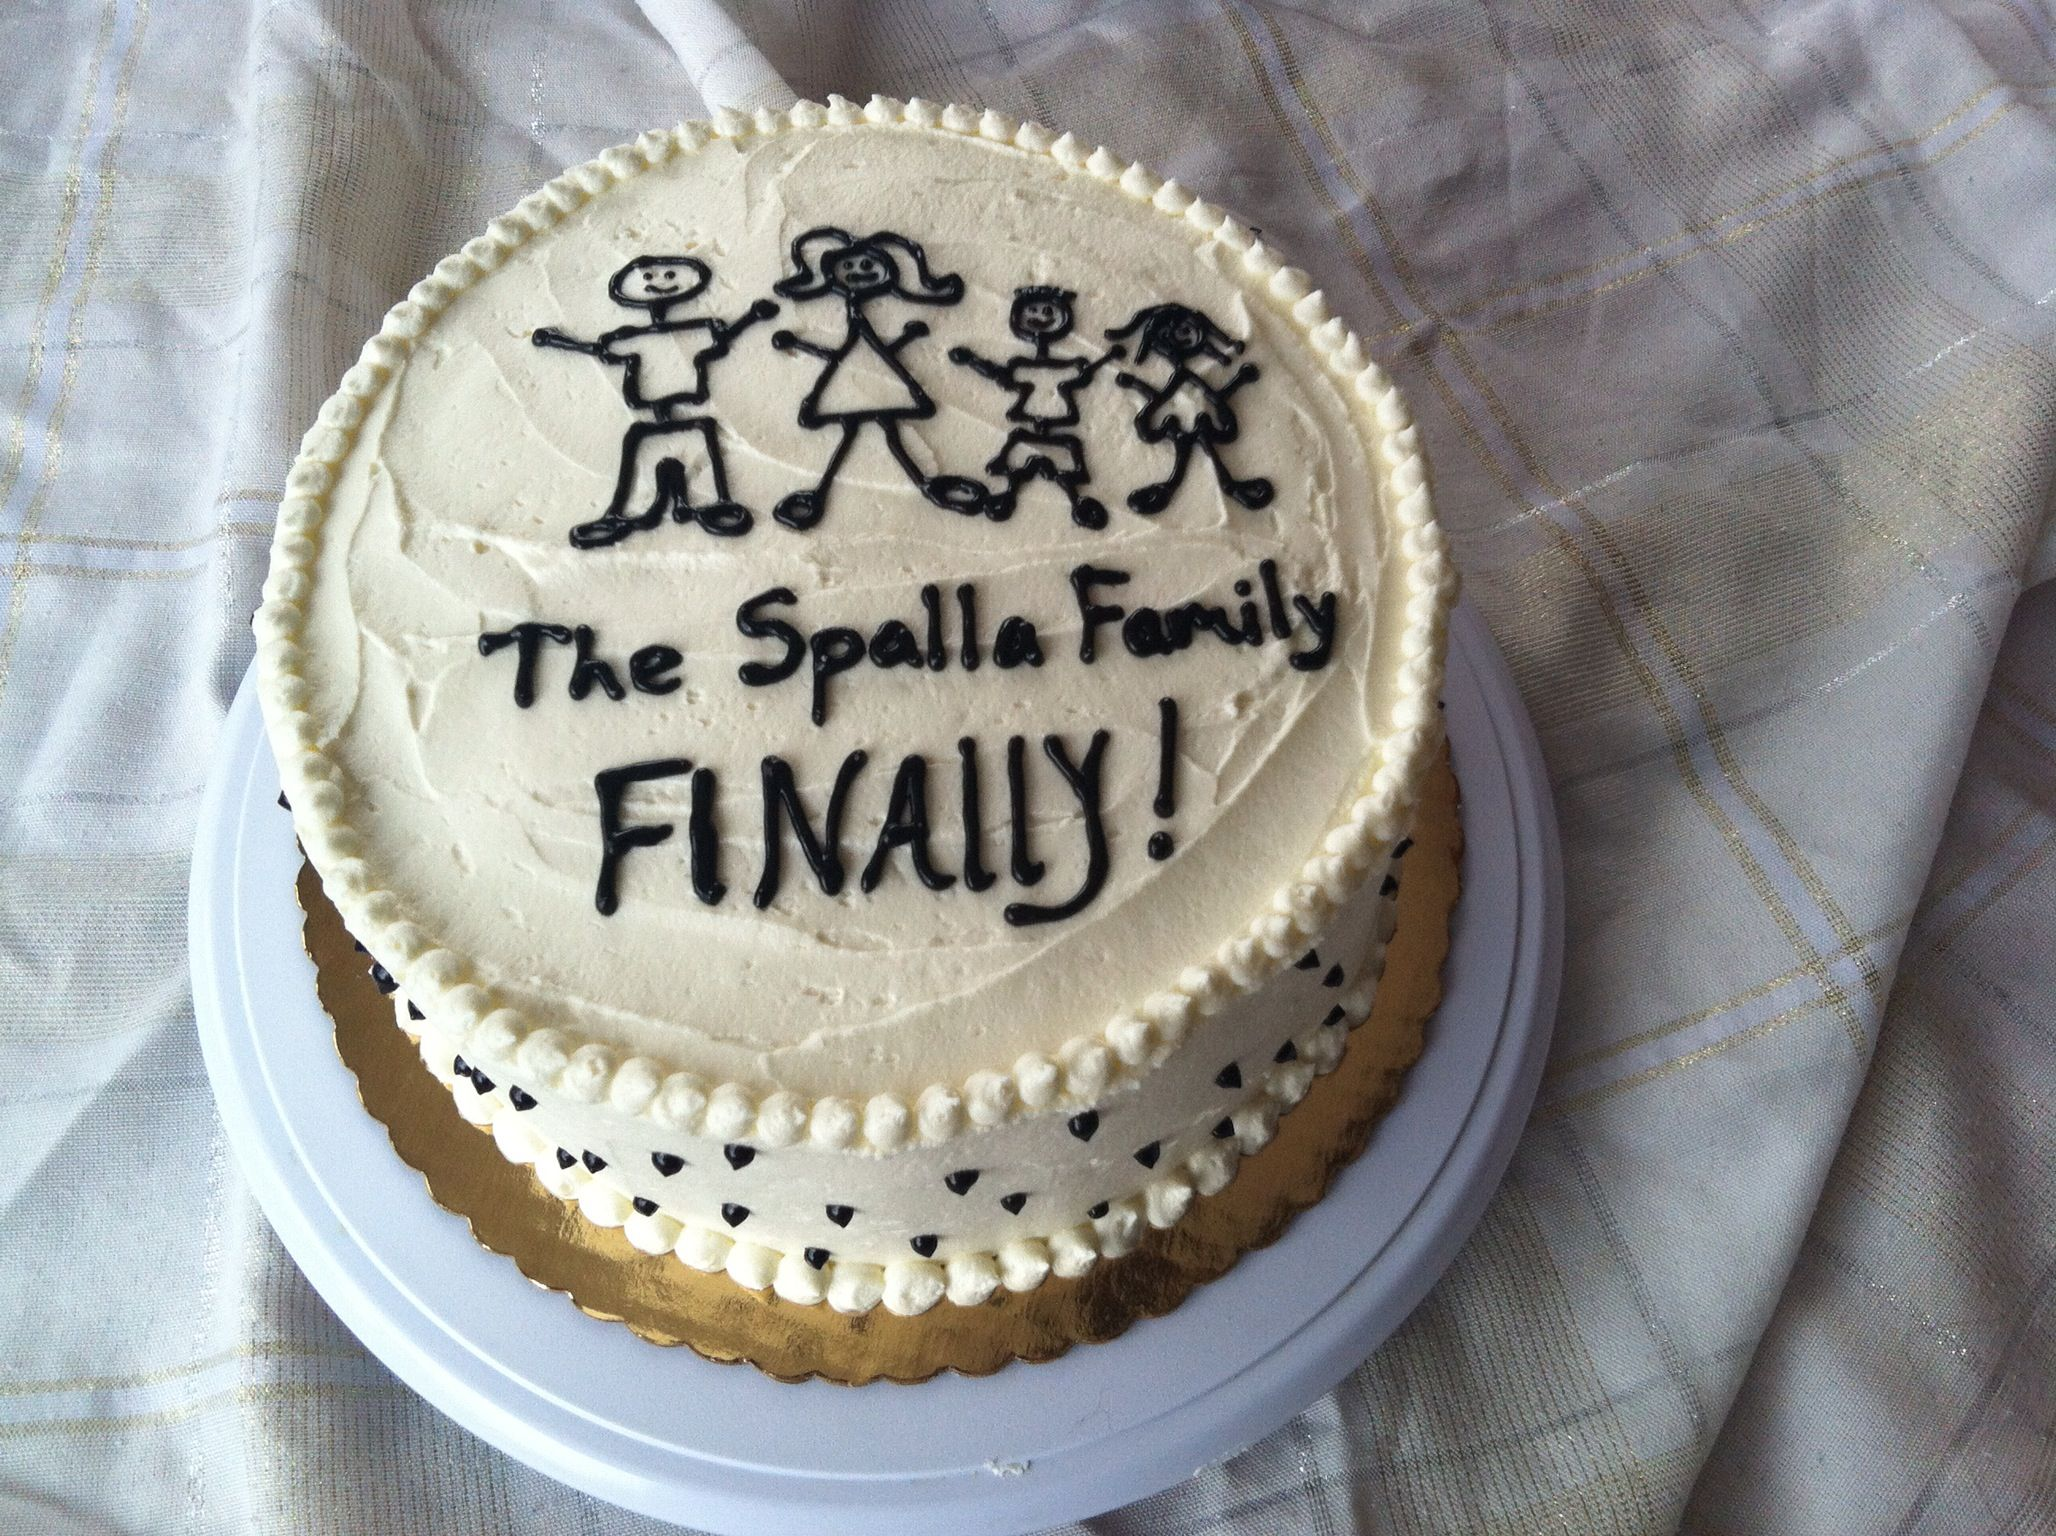 Adoption Cake Stick Figure Family 3 Layers Yellow Cake